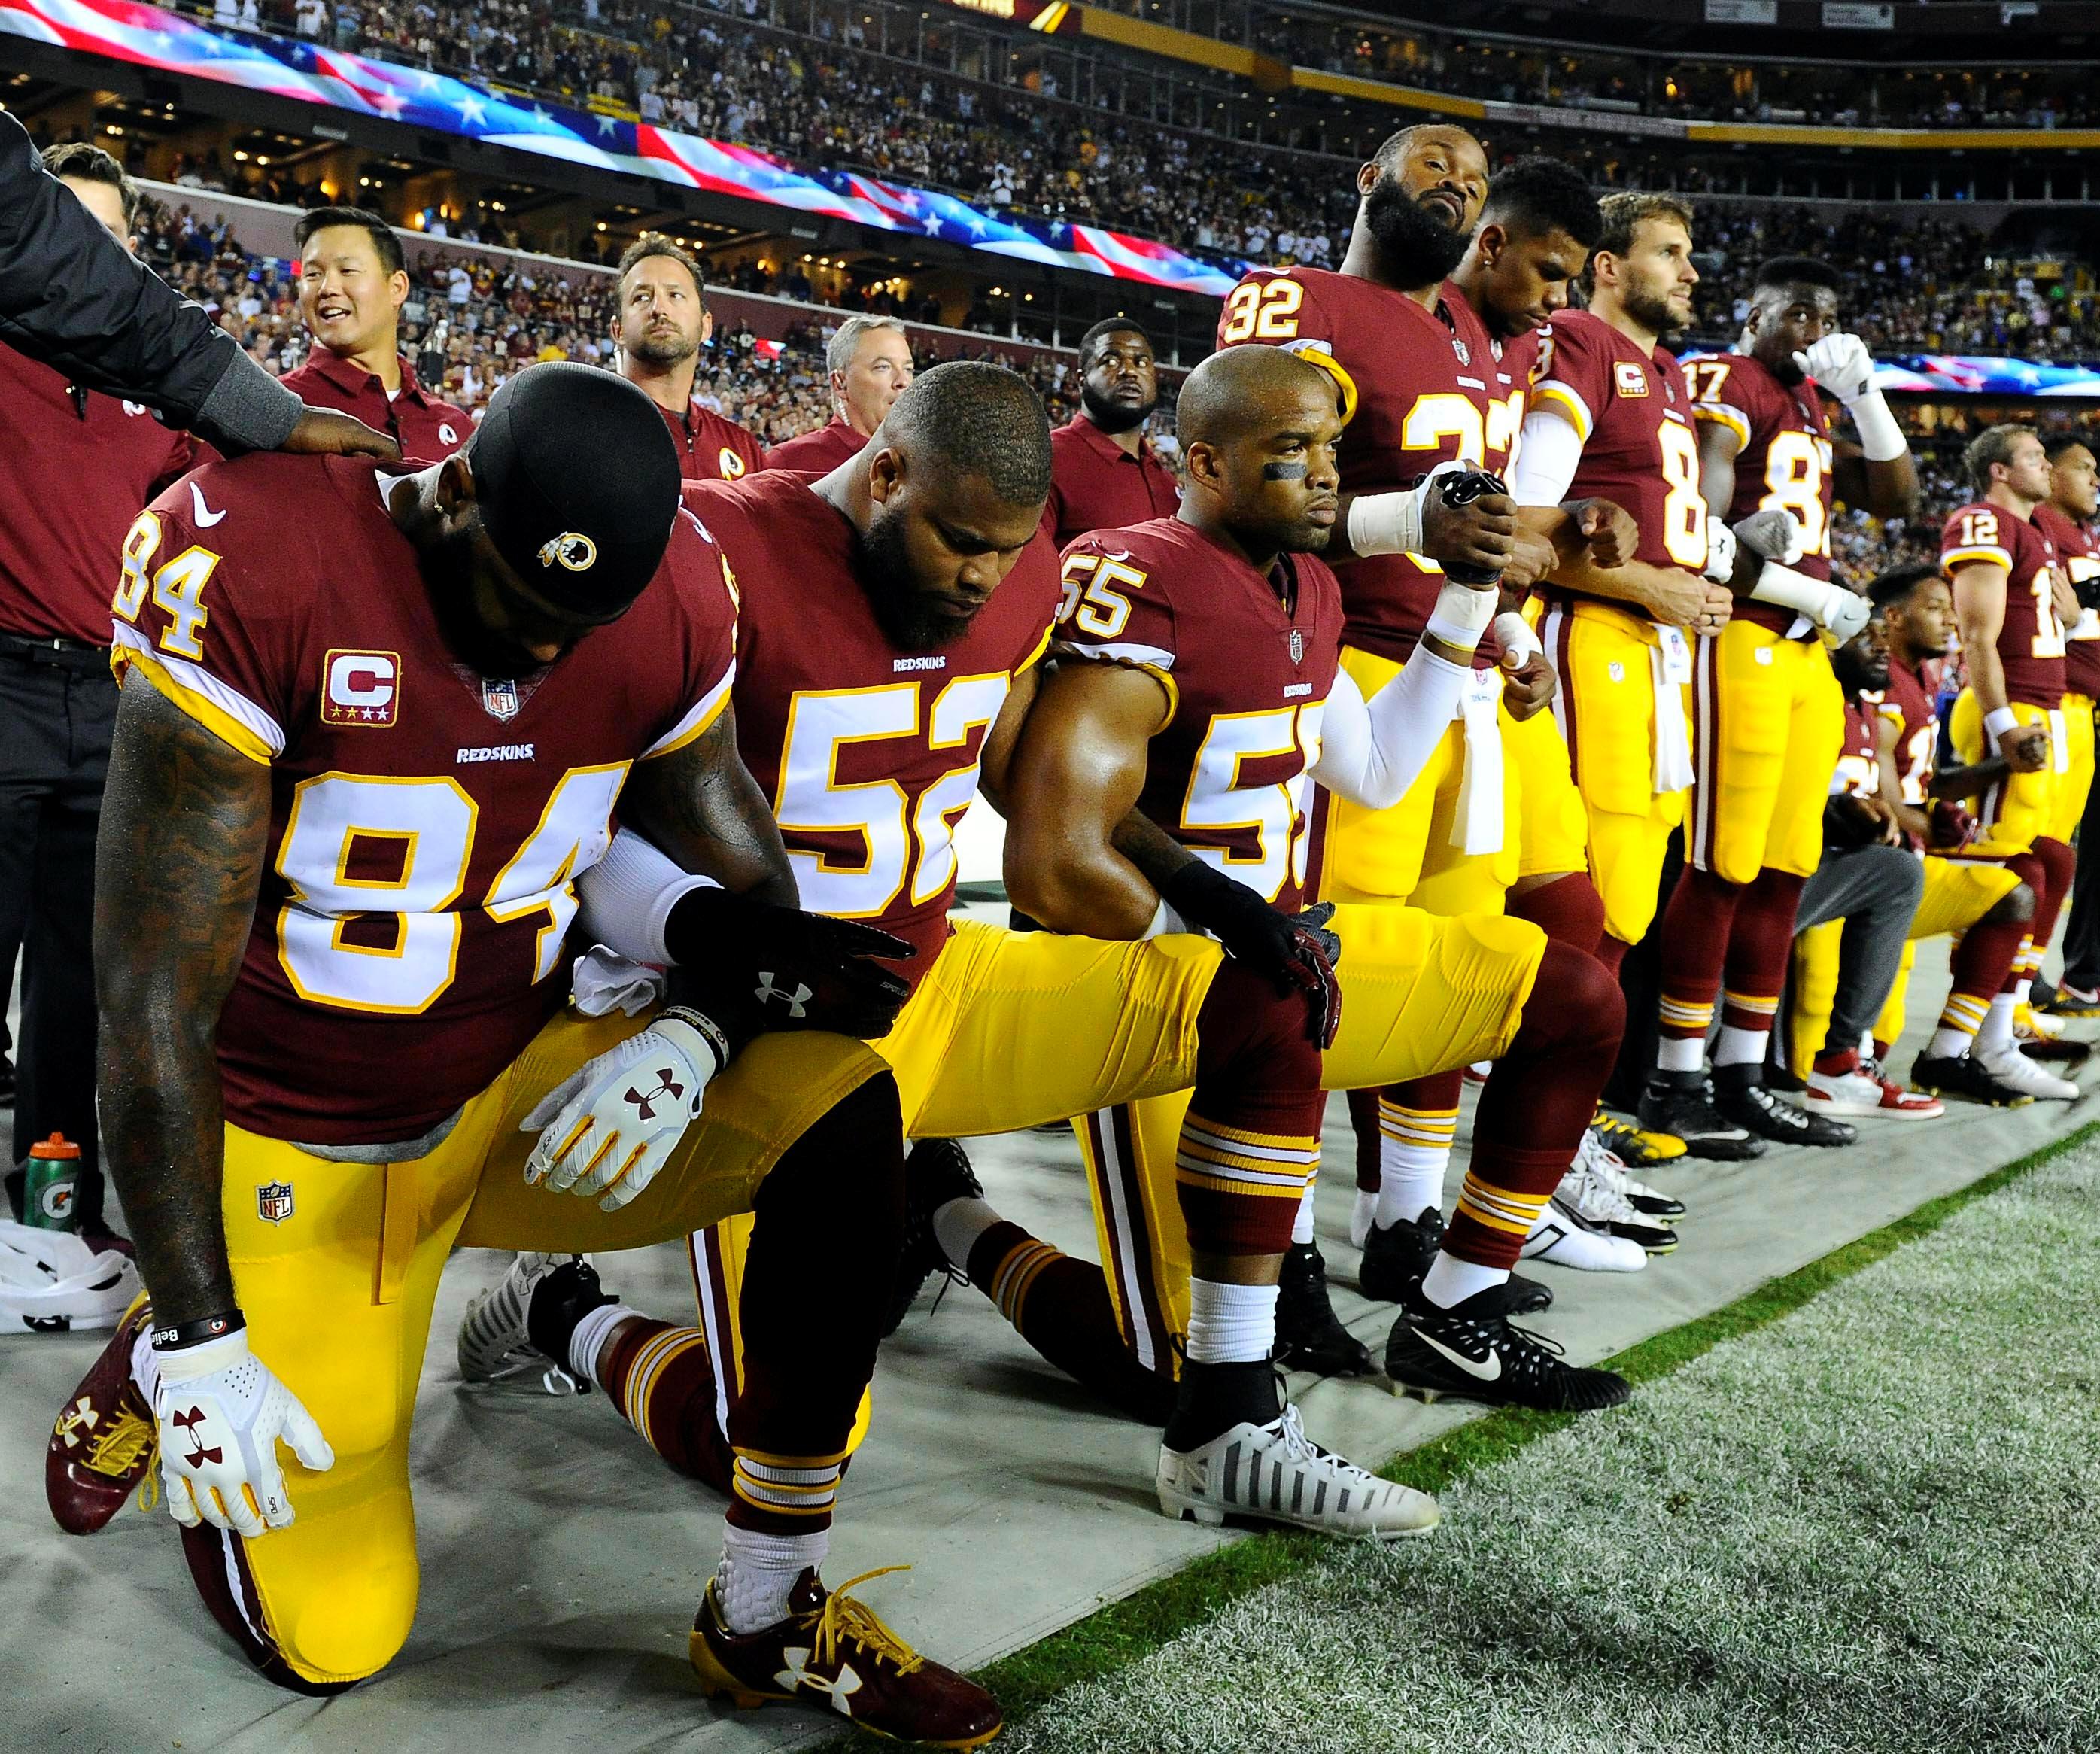 (Photo Credit: Brad Mills-USA TODAY Sports/REUTERS)